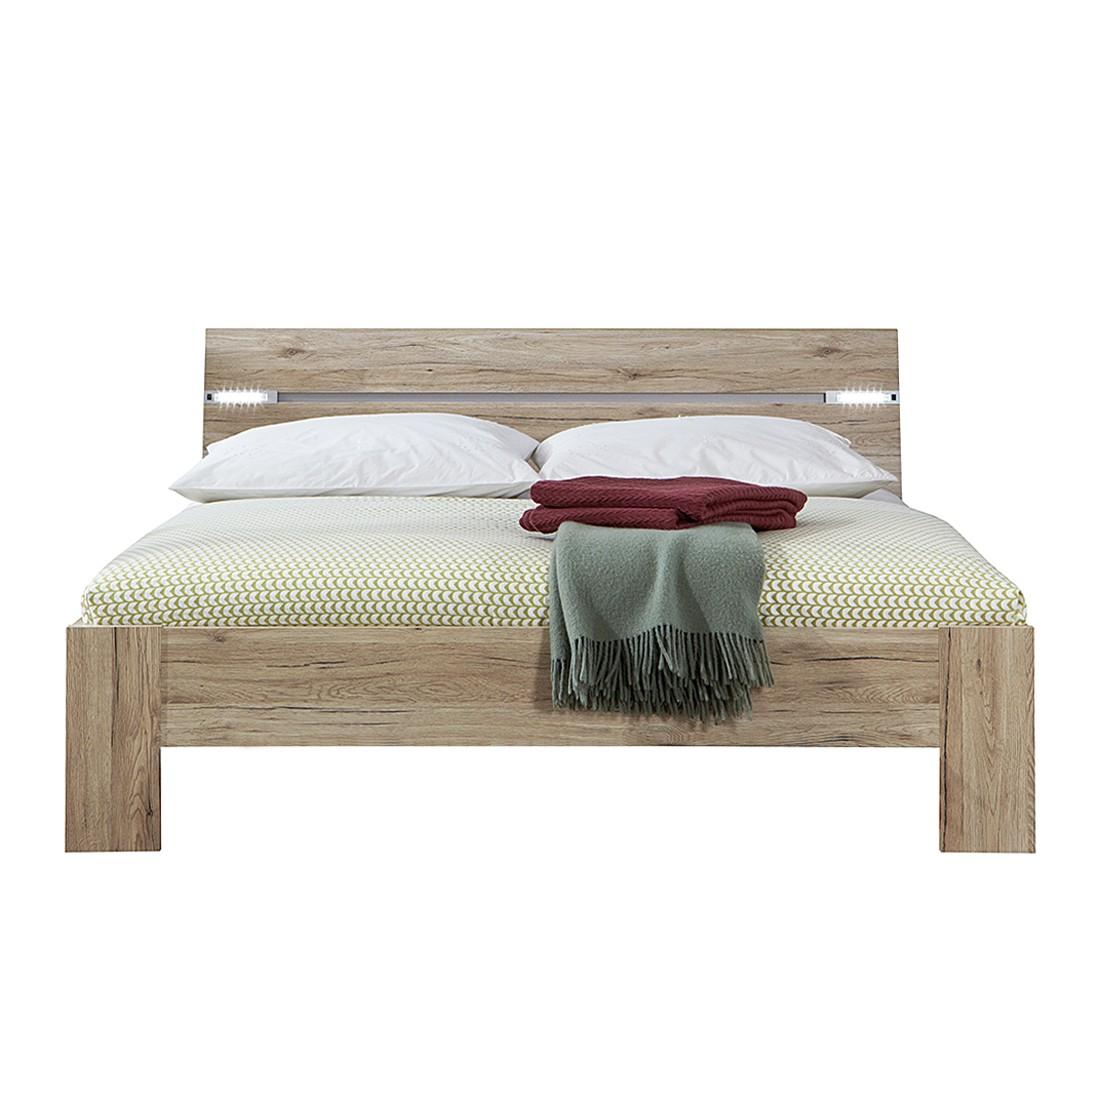 Bed Saxman - 180 x 200cm - San Remo eikenhouten look, Wimex